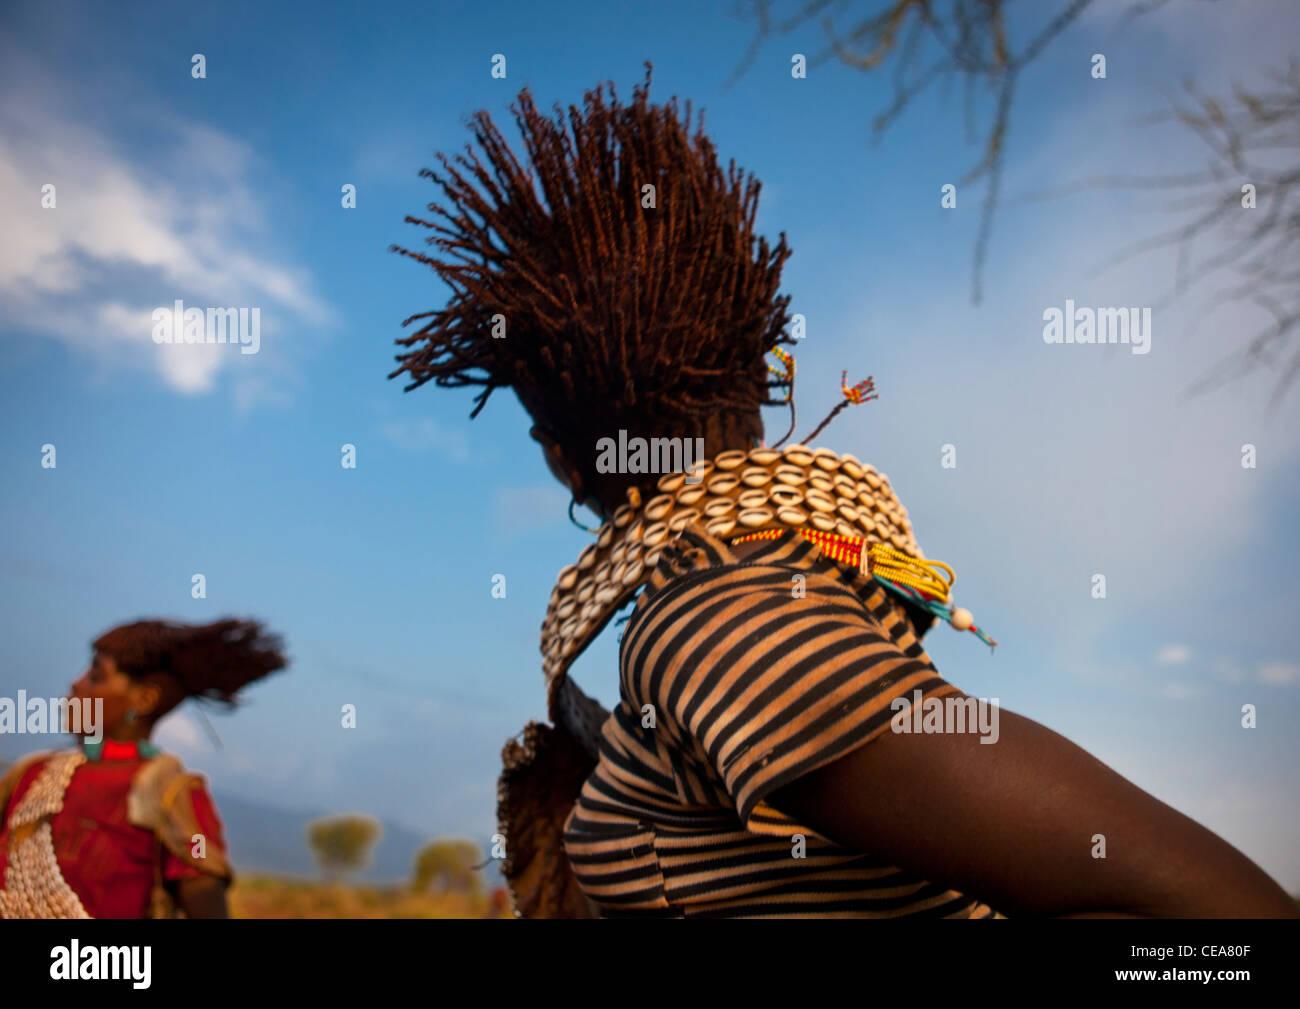 Banna Woman Agitating Her Hair Bull Jumping Ceremony Ethiopia - Stock Image